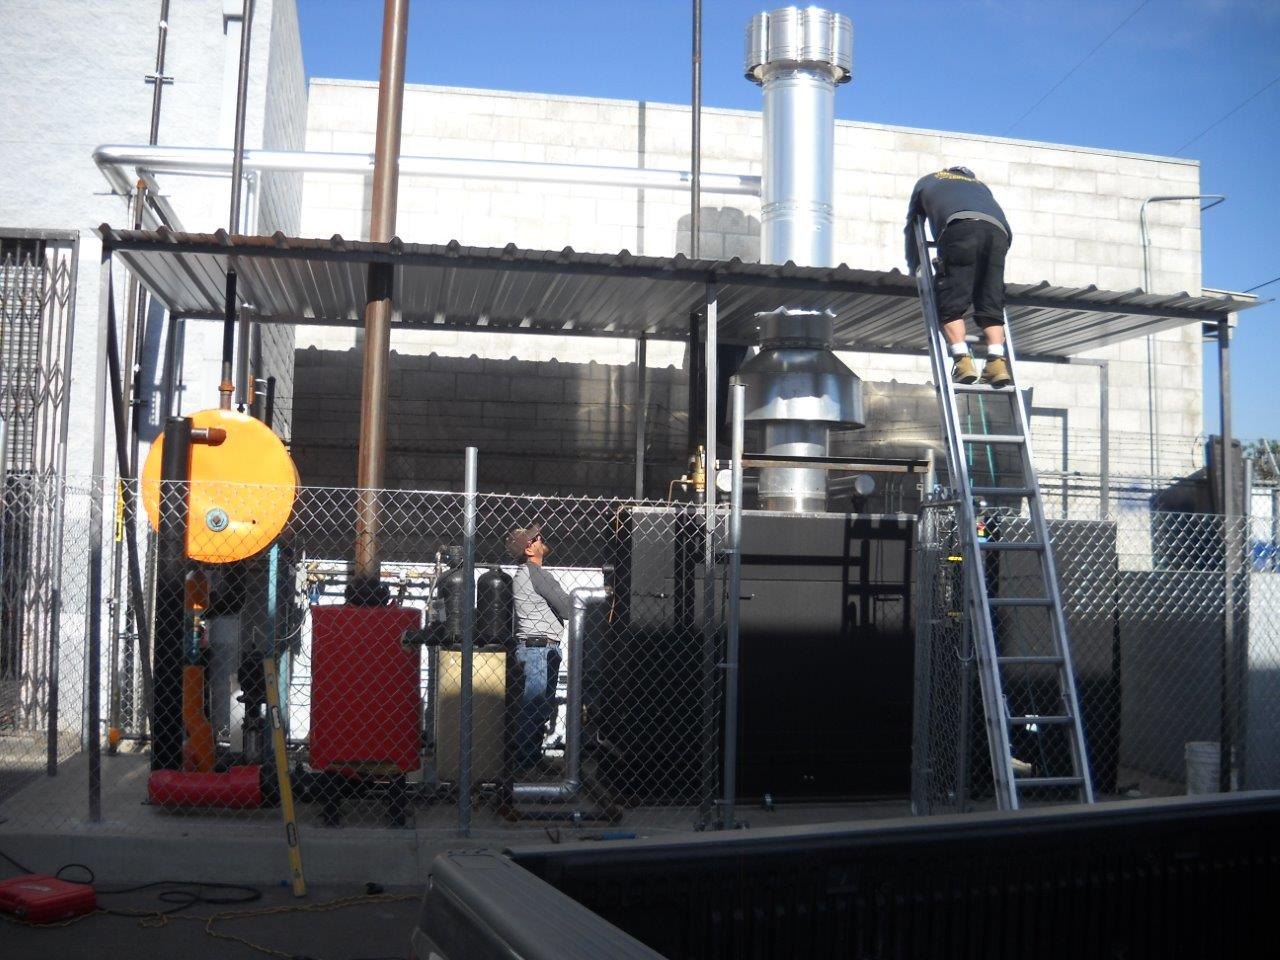 Parker Steam Boiler Wiring Diagram System Porter Service 1280x960